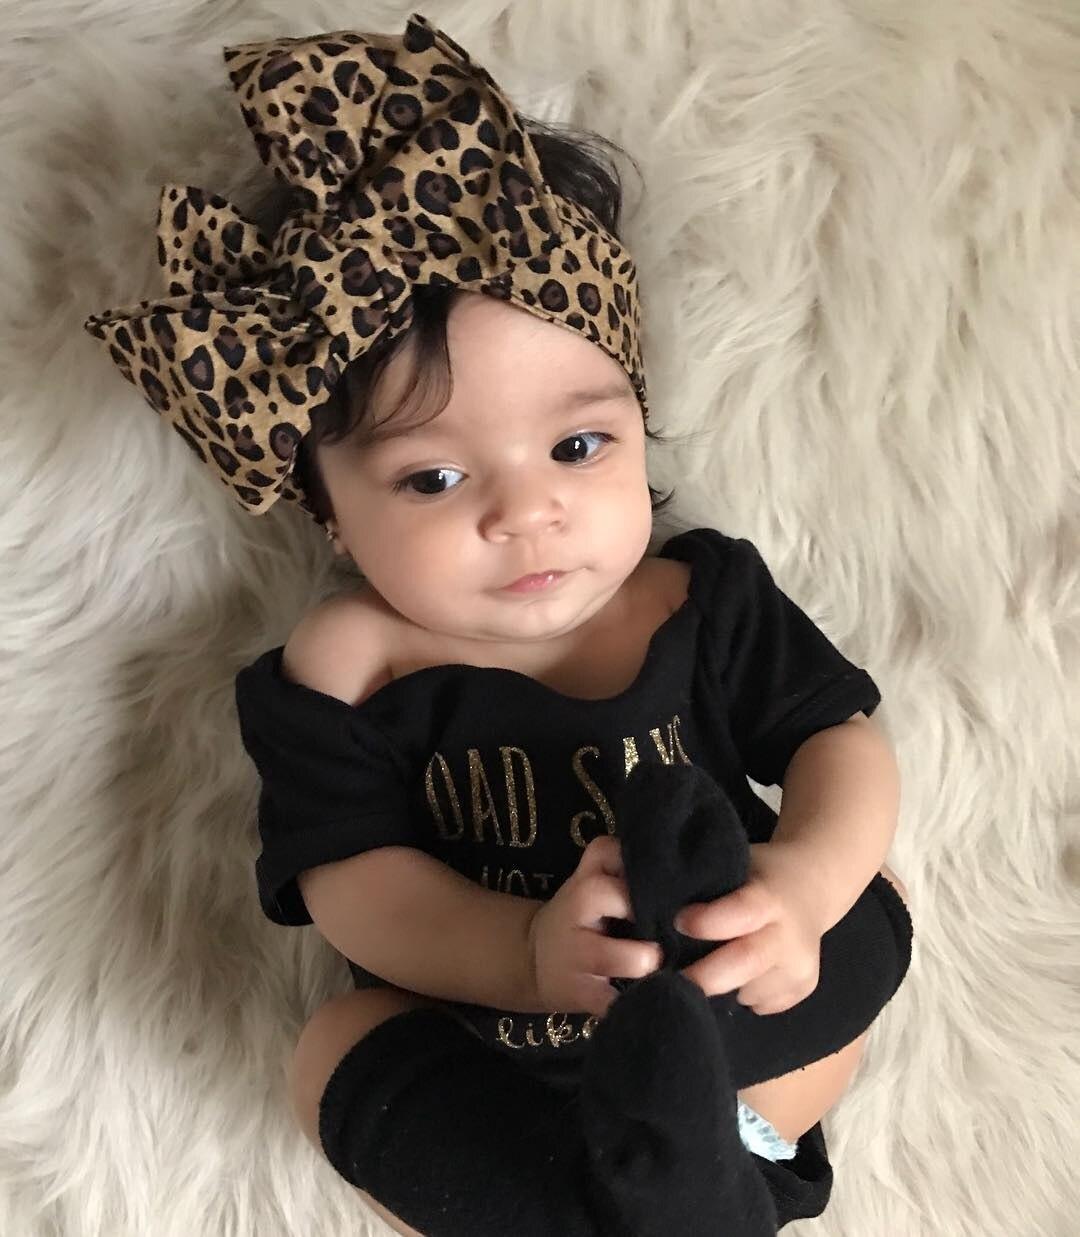 Trendy Kids Baby Girls Clothes off shoulder Bodysuit Leopard Headband 2pc cotton